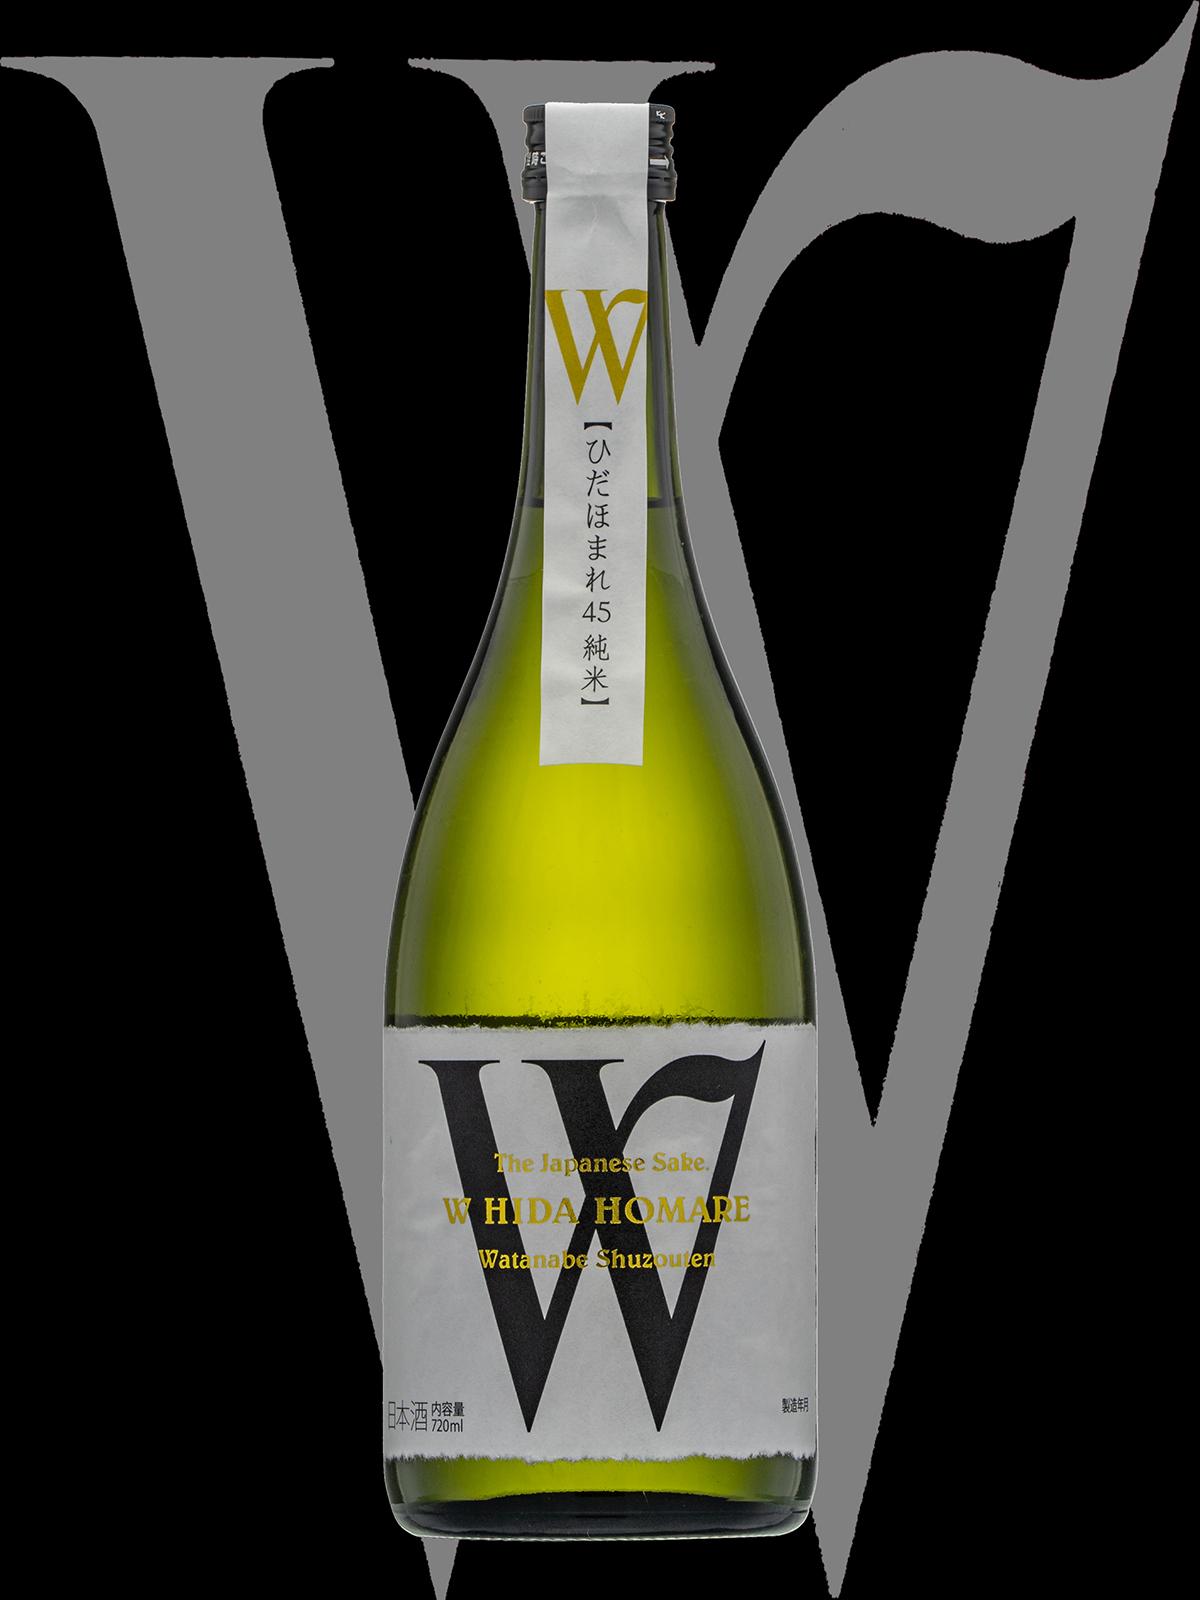 W(ダブリュー)「純米大吟醸」ひだほまれ無濾過生原酒